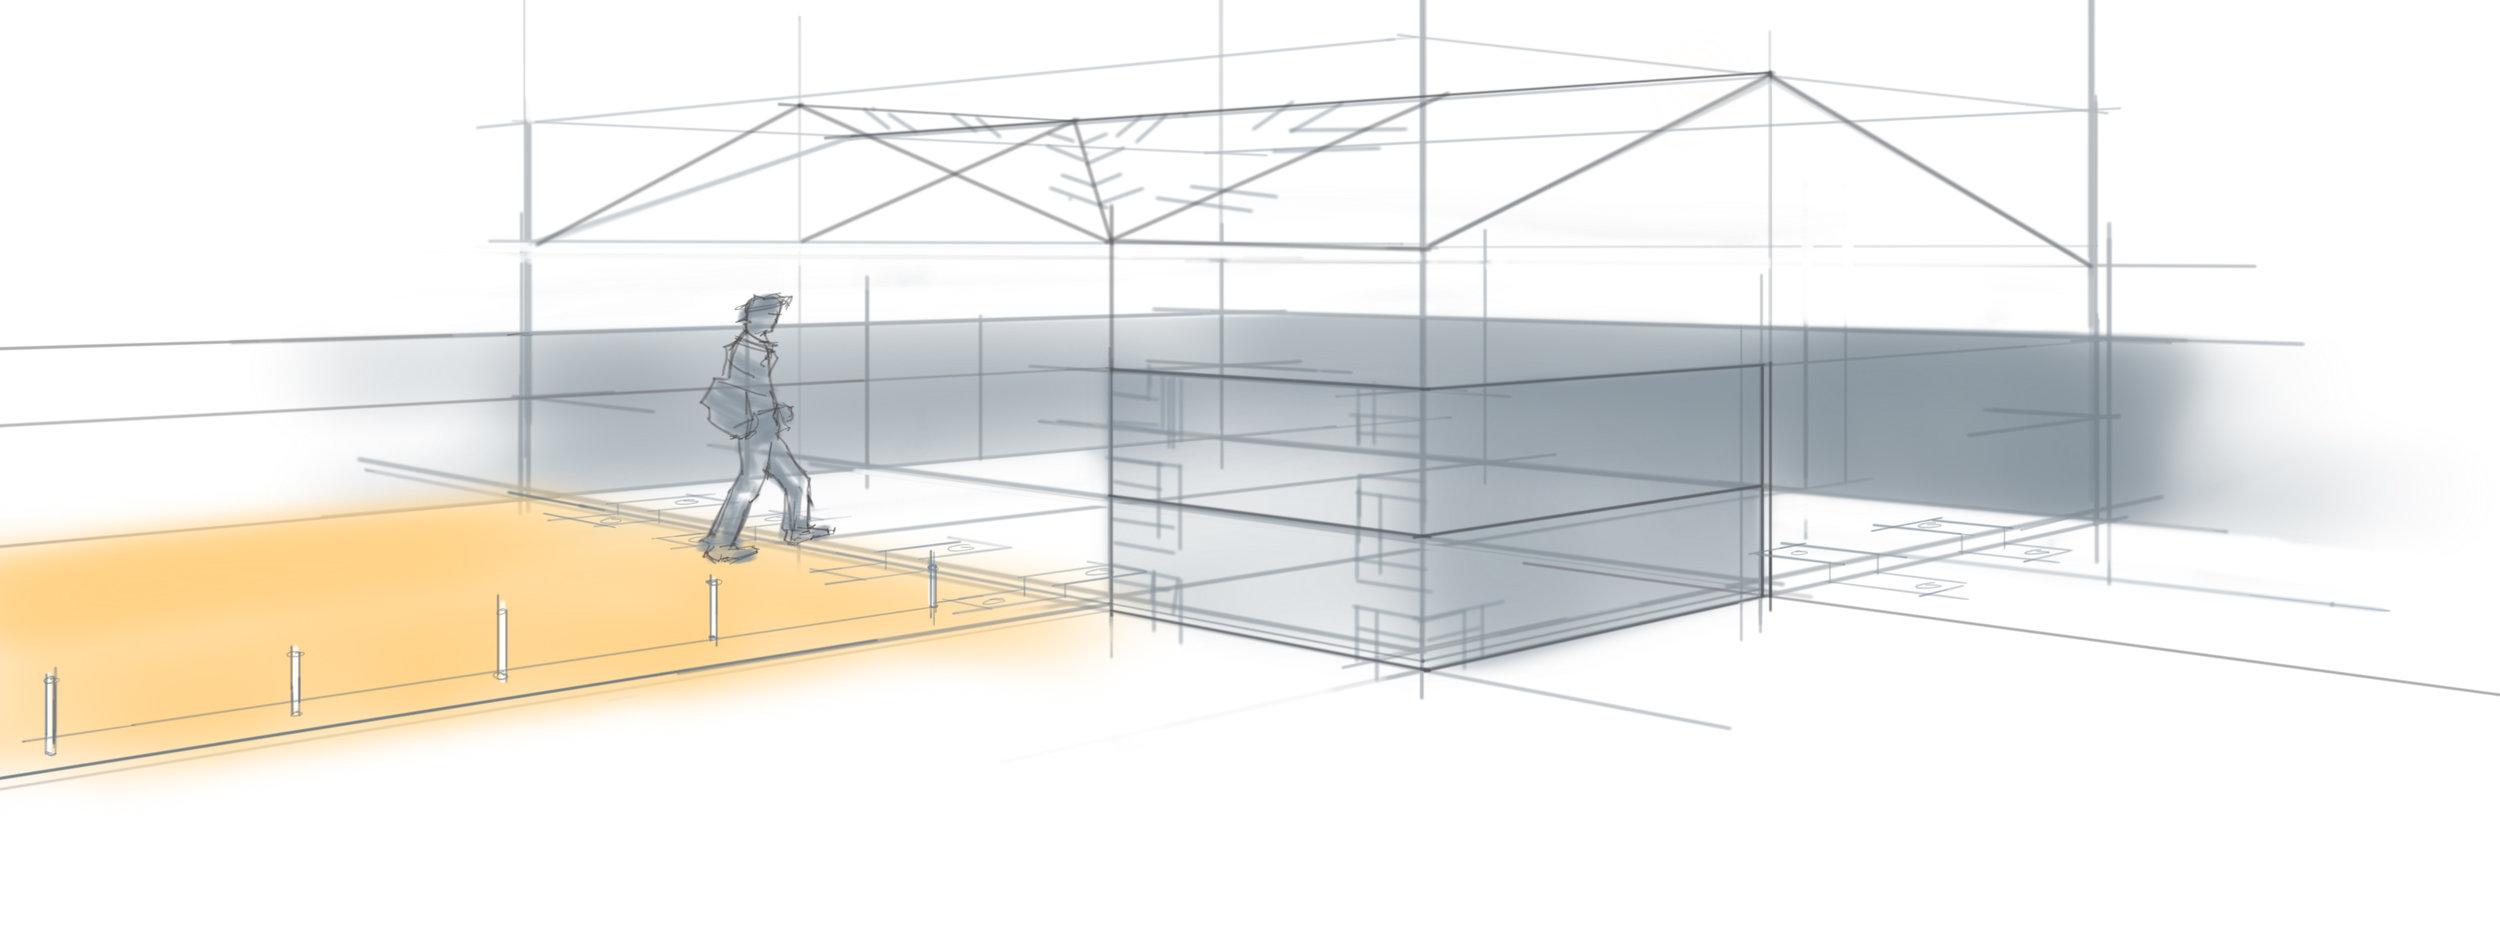 02_panel_structure.jpg